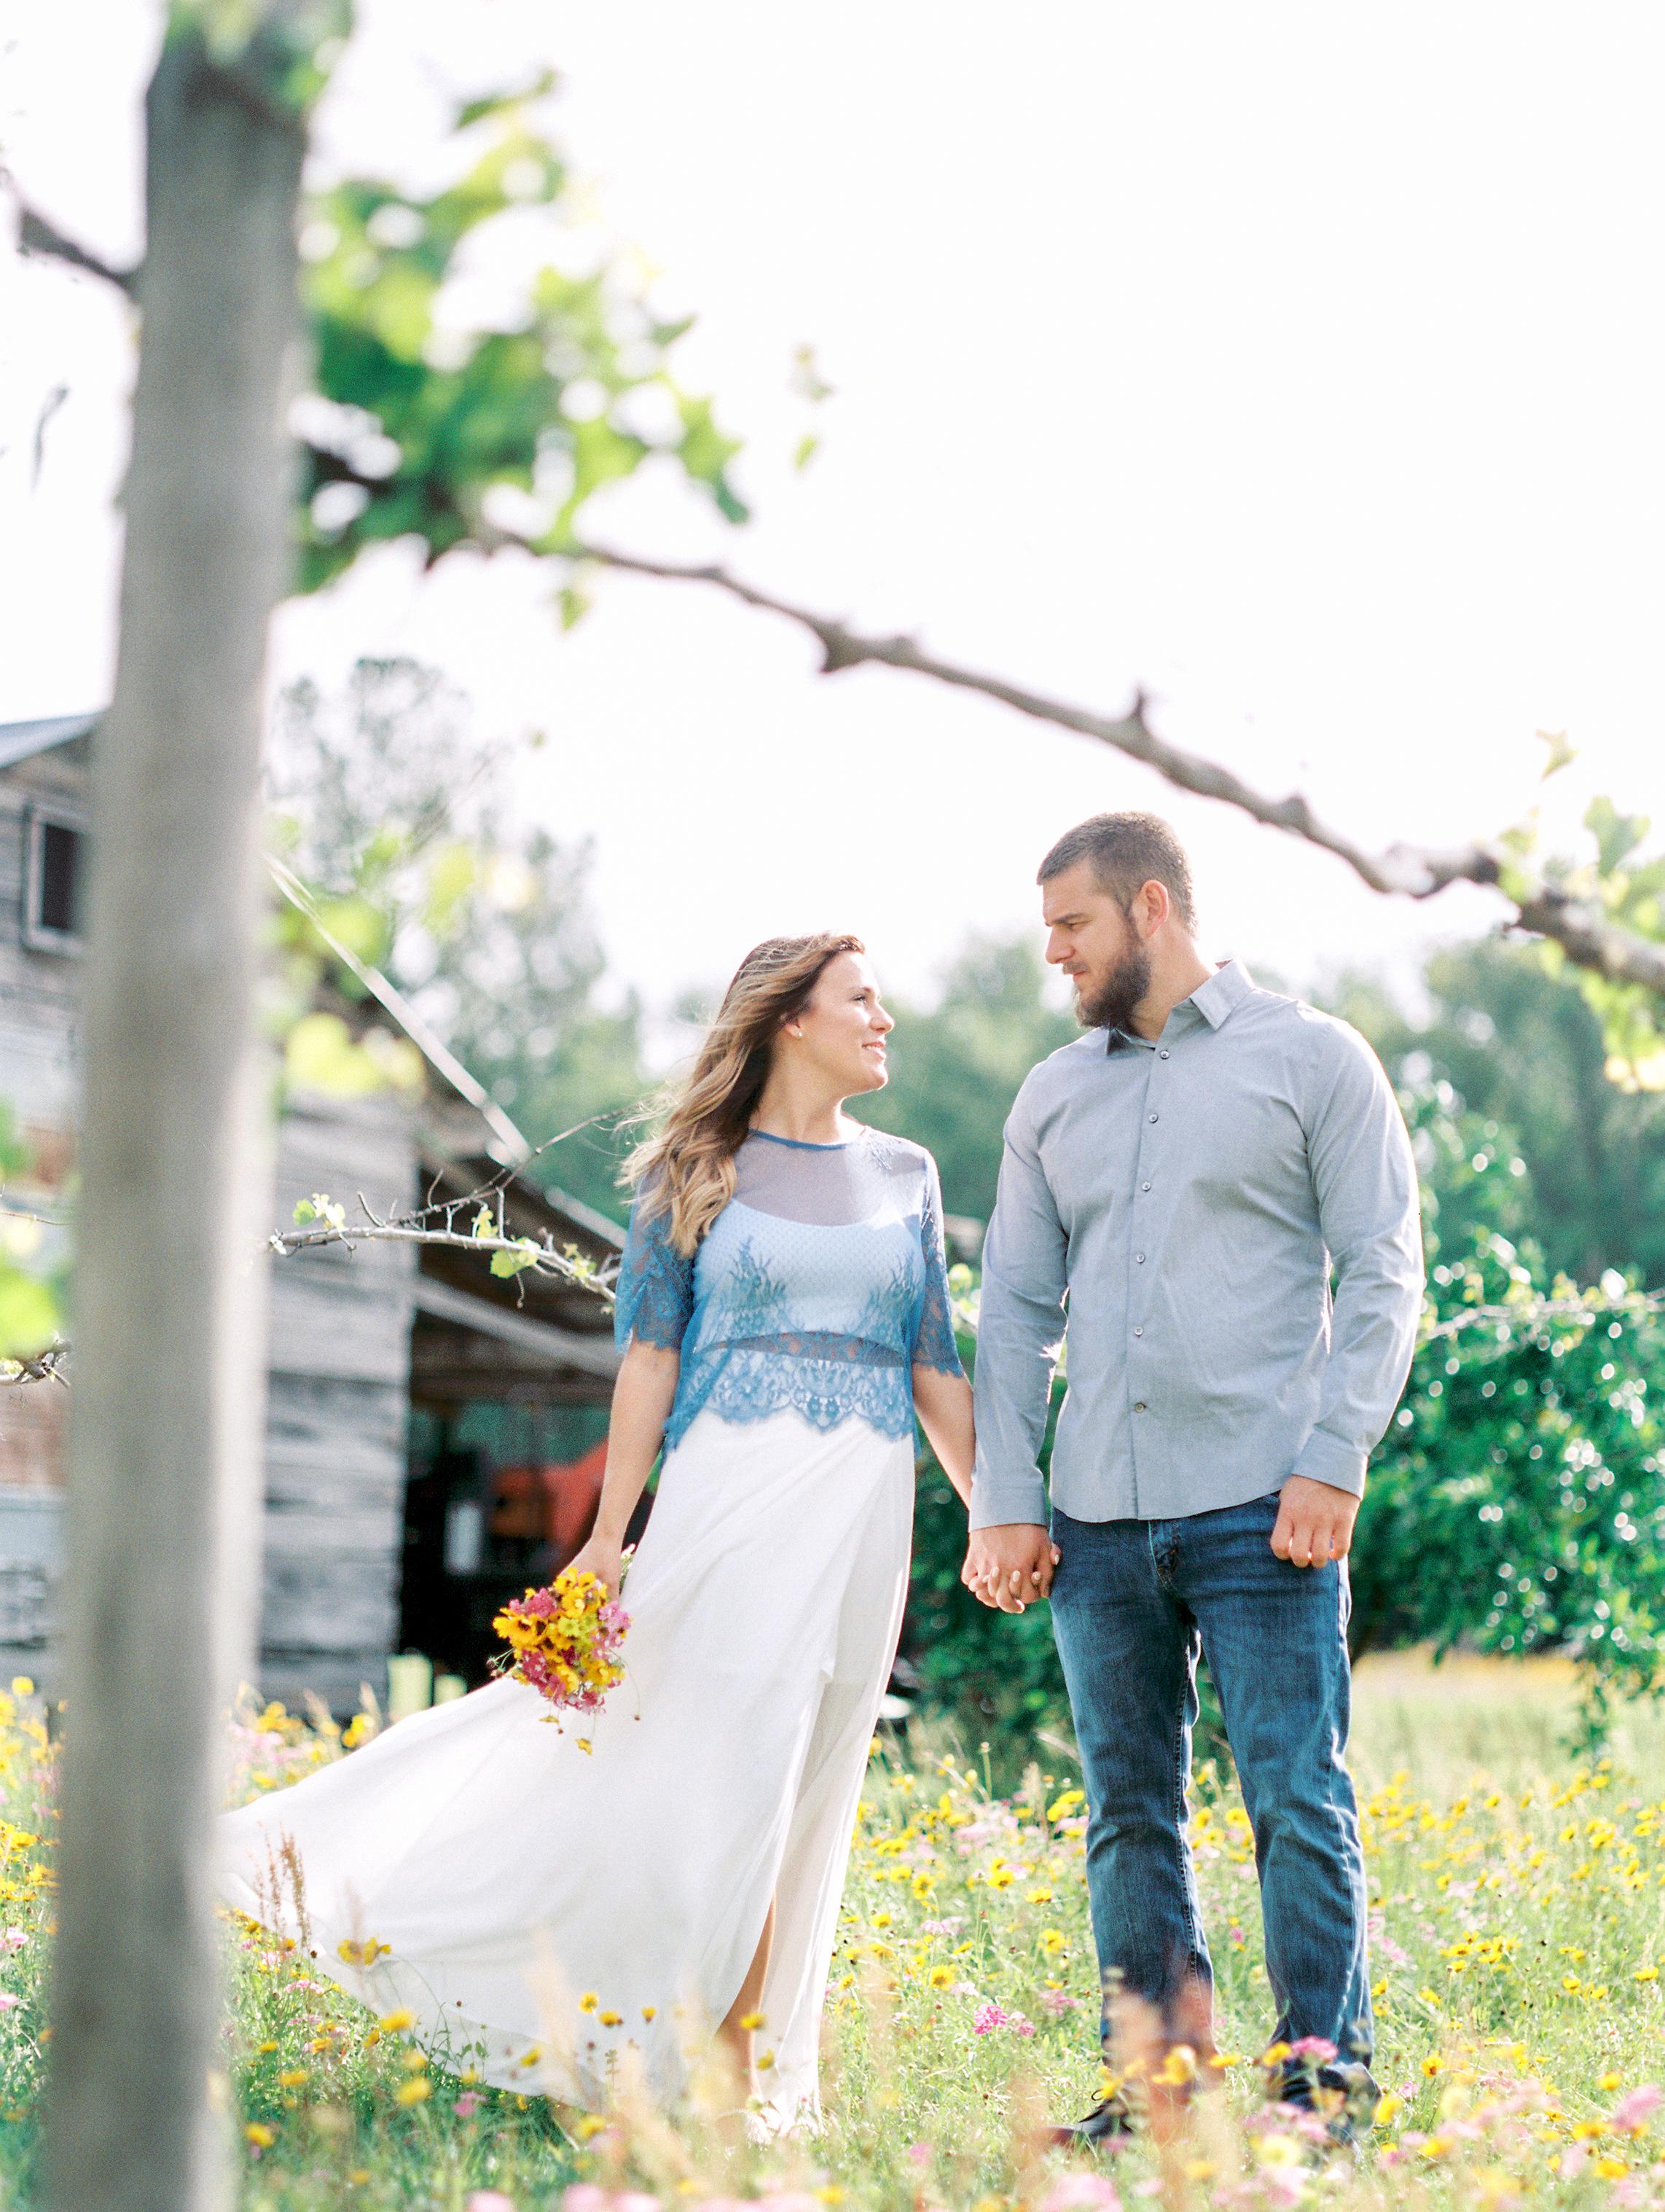 Lisa Silva Photography- Jacksonville, Florida Fine Art Film Wedding Photography (16 of 108).jpg